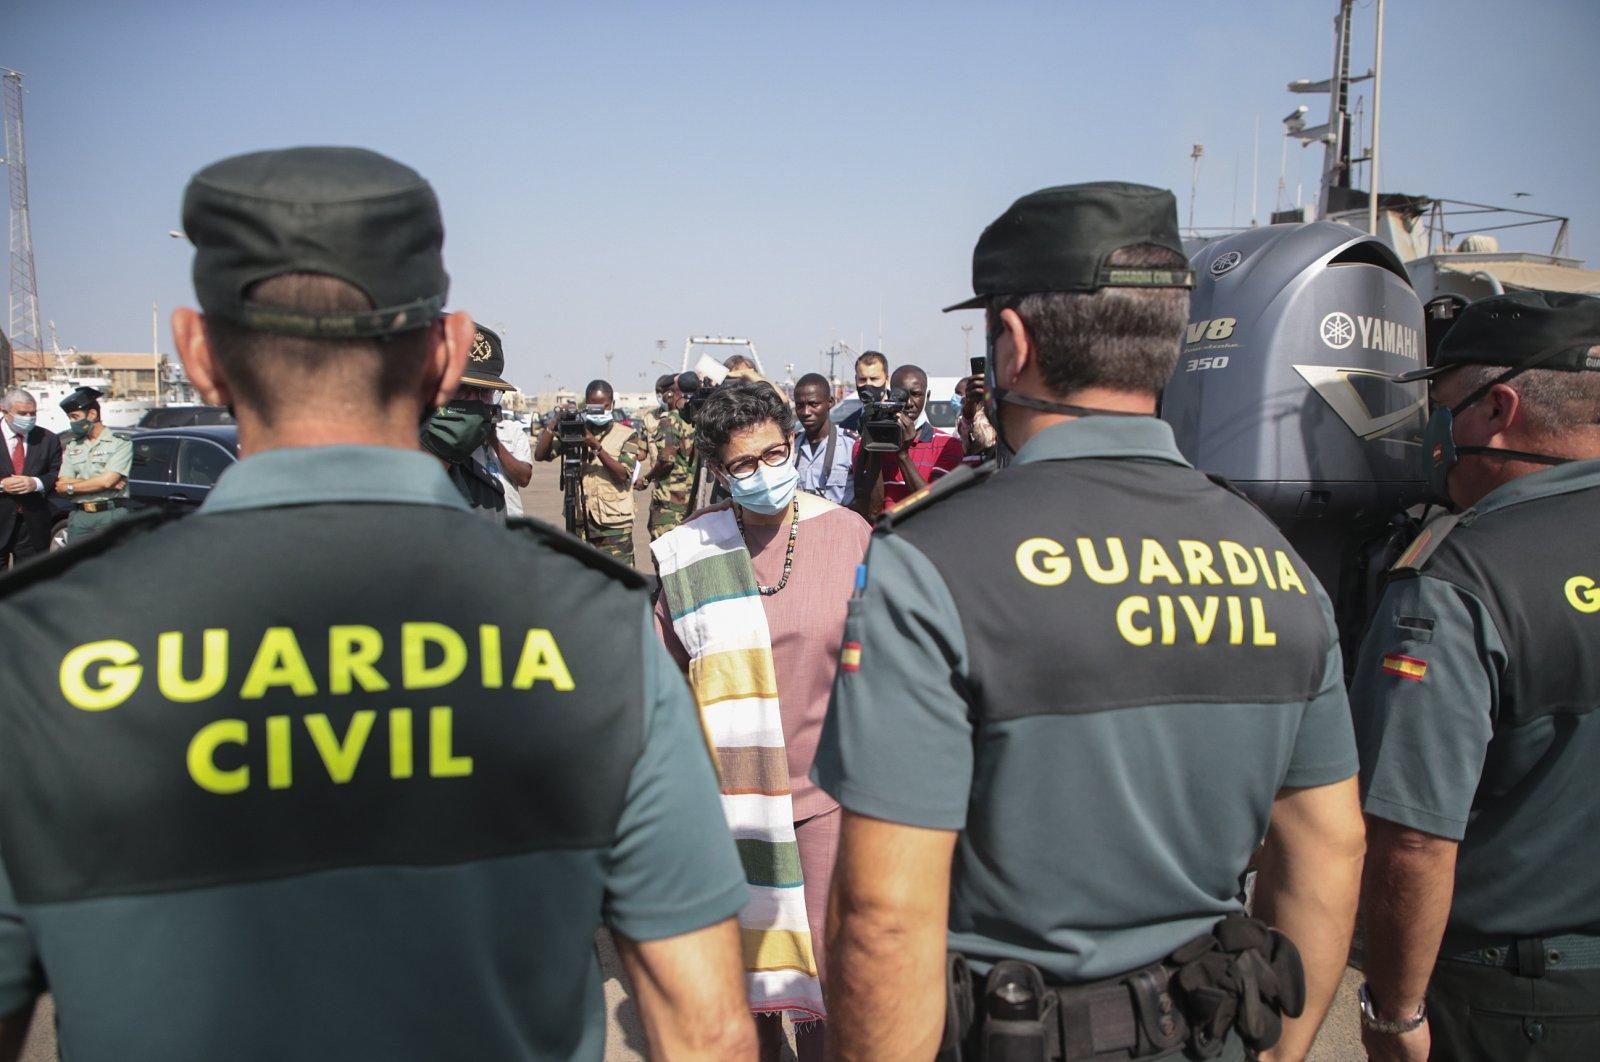 Spanish Foreign Minister Arancha Gonzalez Laya (C) visits the Spanish Civil Guard at the Port of Dakar, Senegal, Nov. 22, 2020. (EPA Photo)